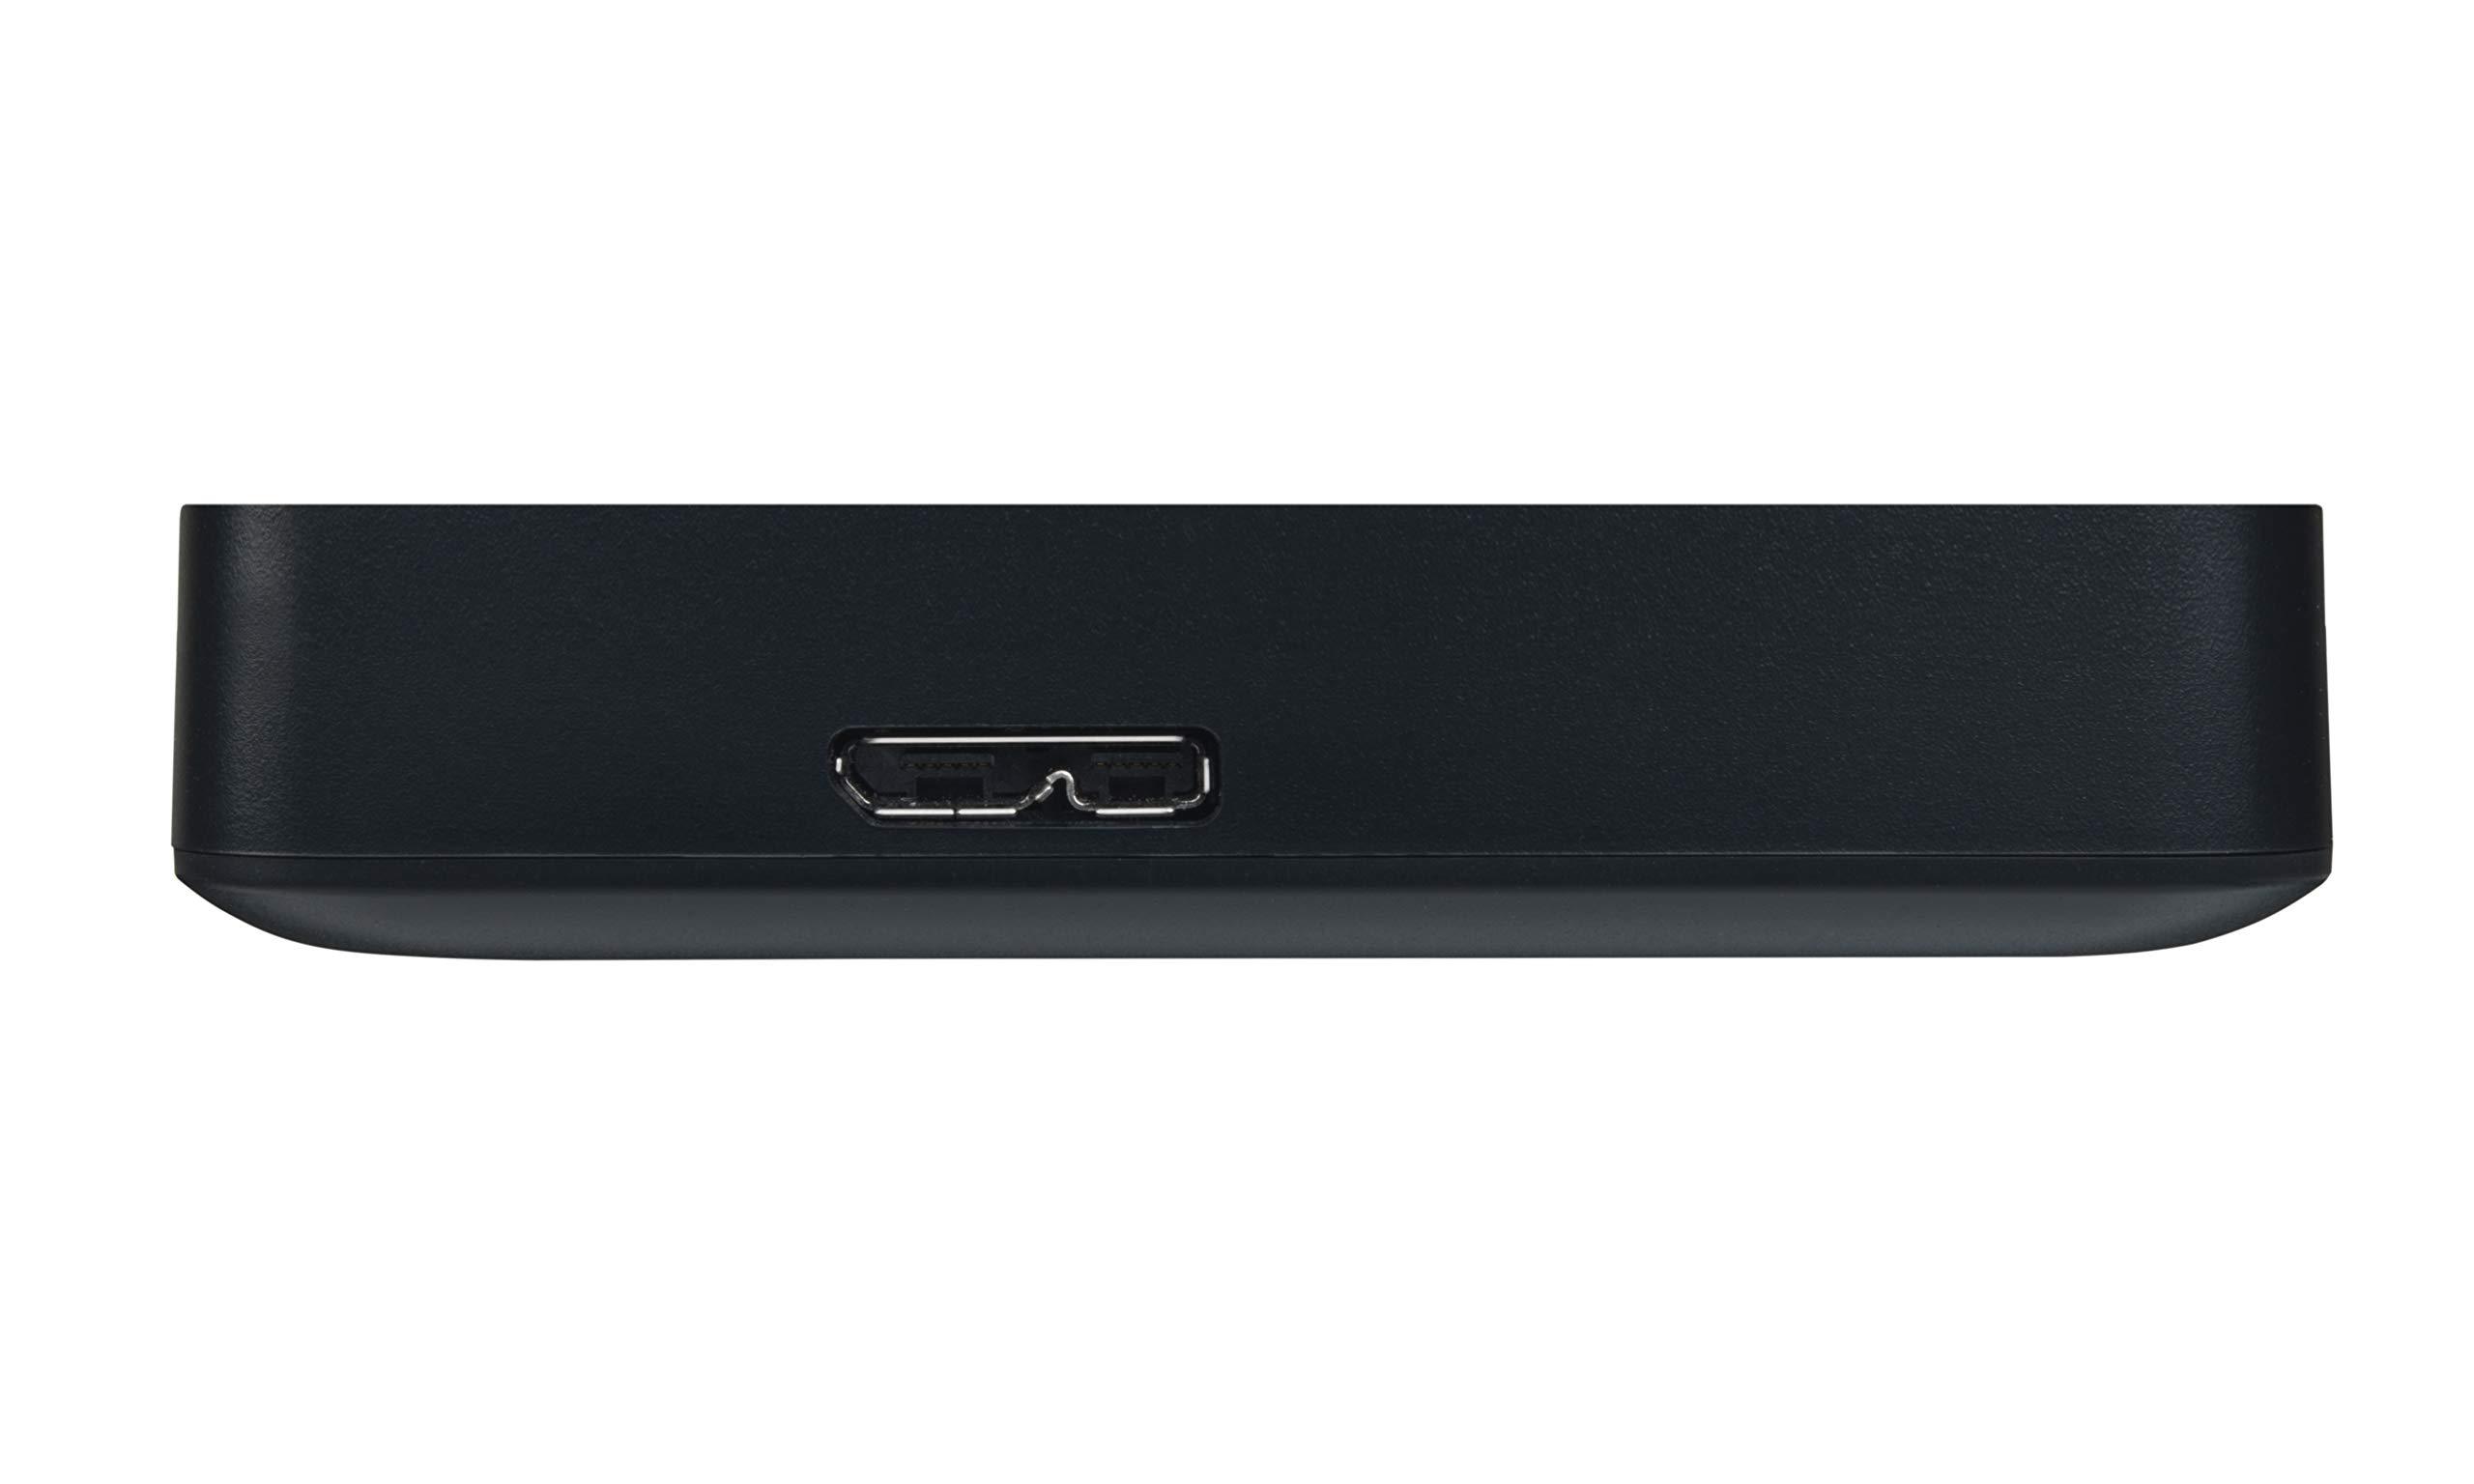 Toshiba Canvio Basics 4TB Portable External Hard Drive USB 3.0, Black (HDTB440XK3CA) by Toshiba (Image #5)